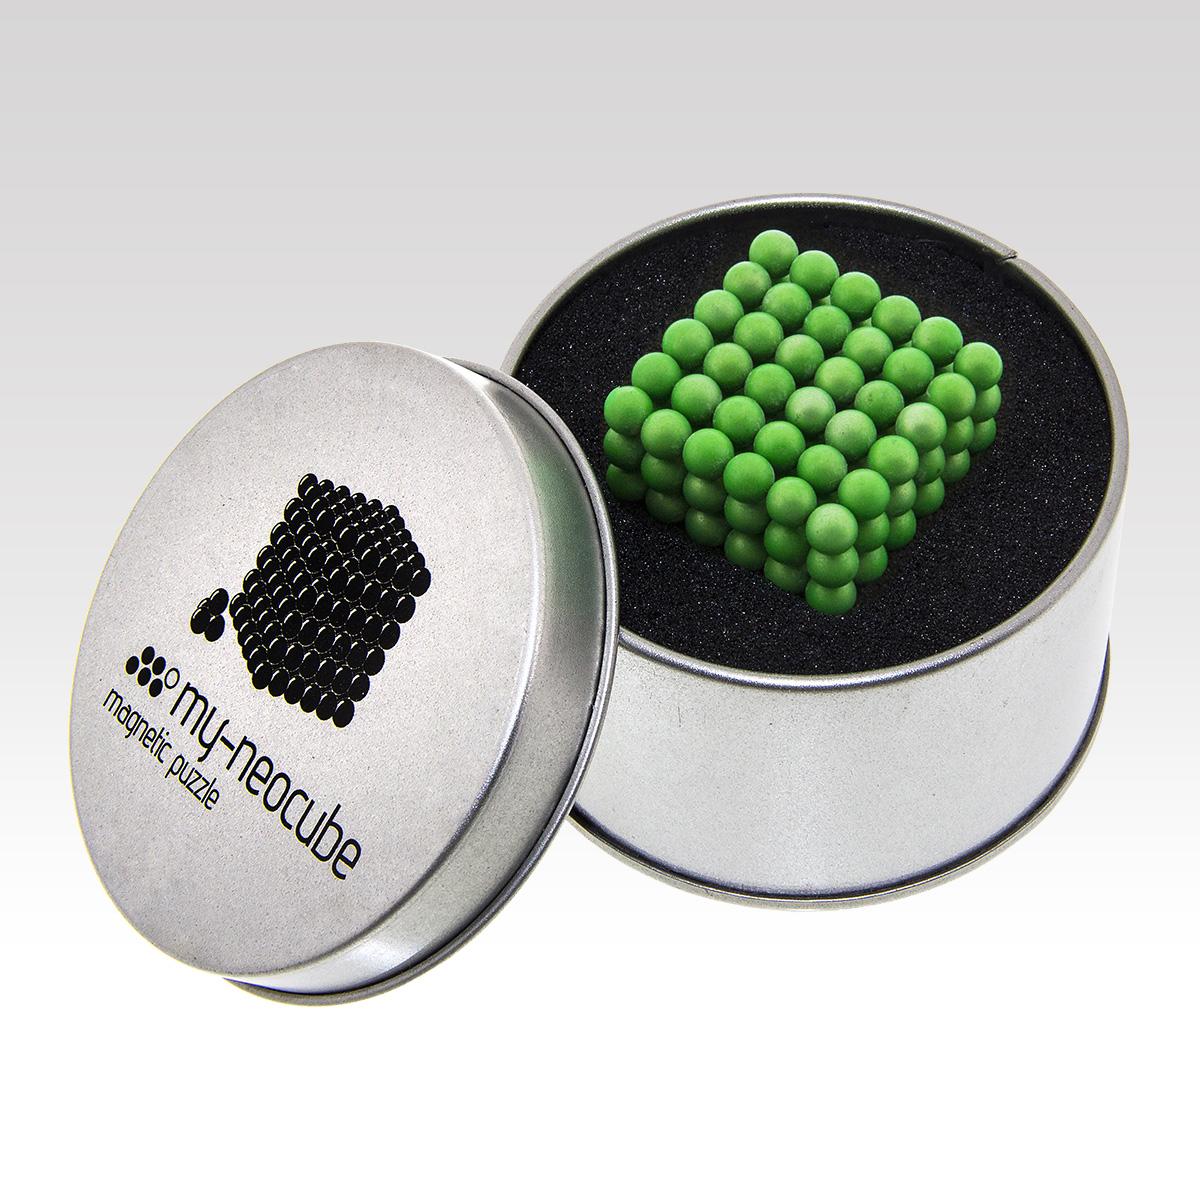 Neocube 5mm glow